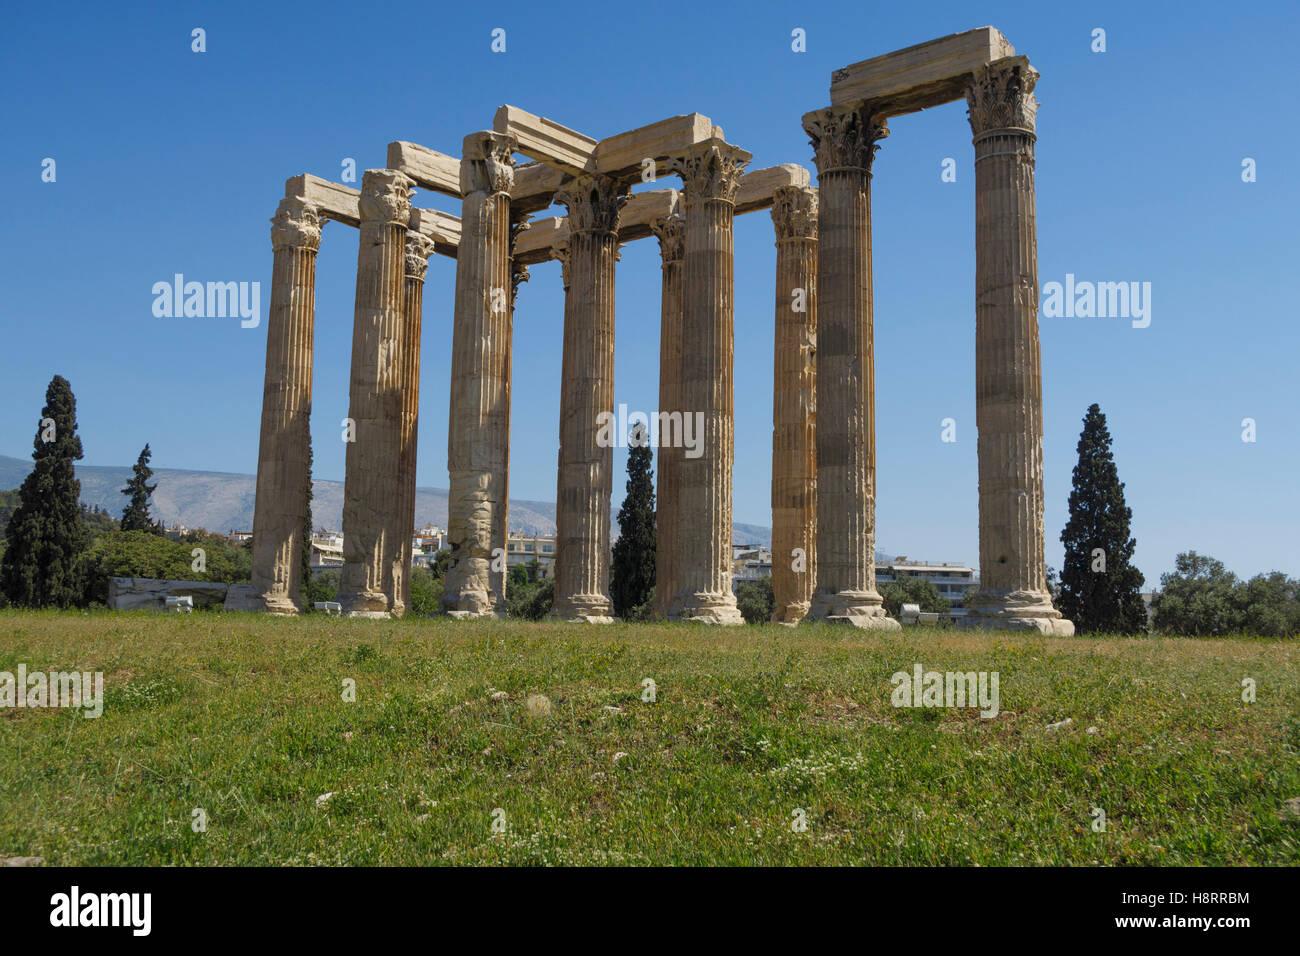 Temple of Olympian Zeus, Athens, Greece - Stock Image